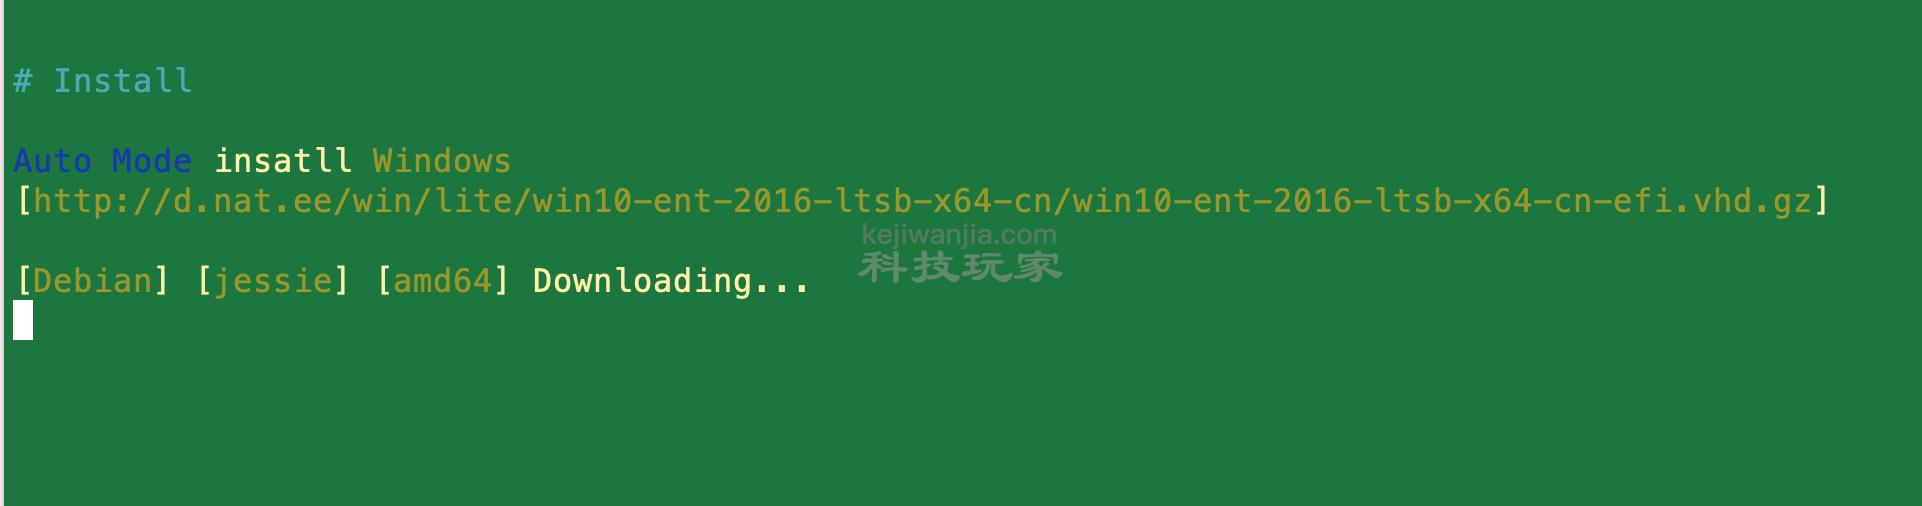 DD windows一件脚本与安装教程(以华为云dd win10为例)